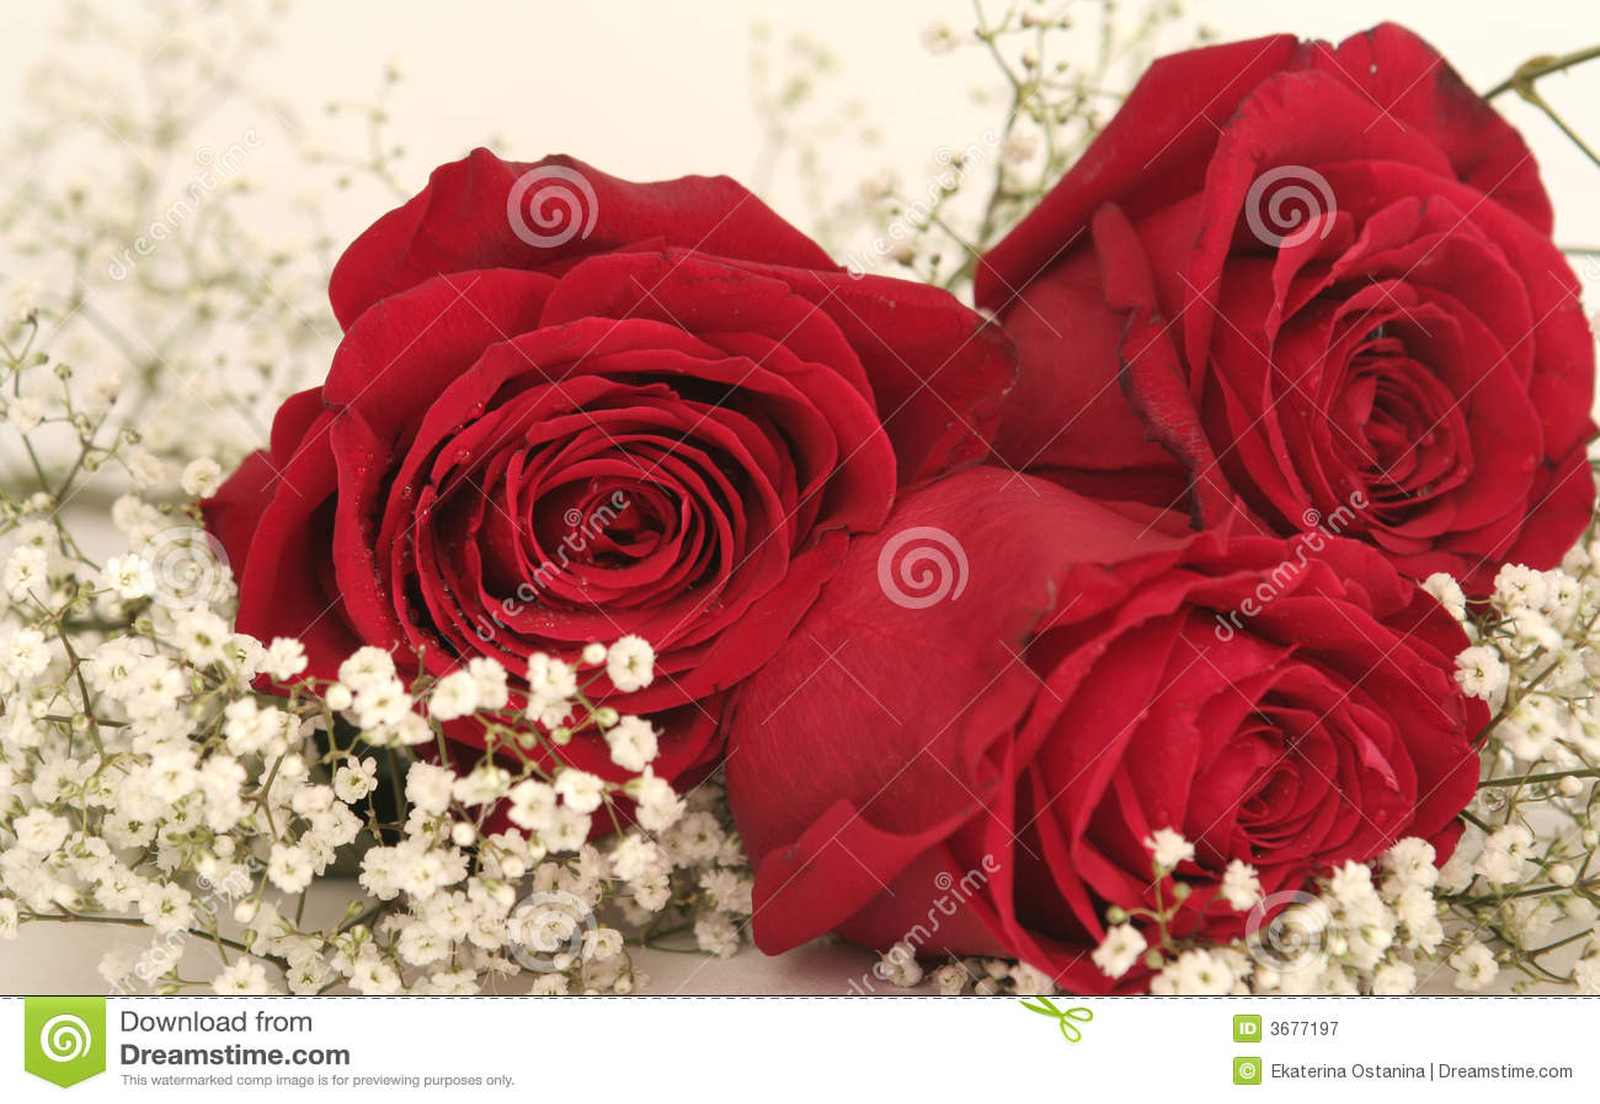 Download Tre belle rose rosse immagine stock. Immagine di fogli - 3677197